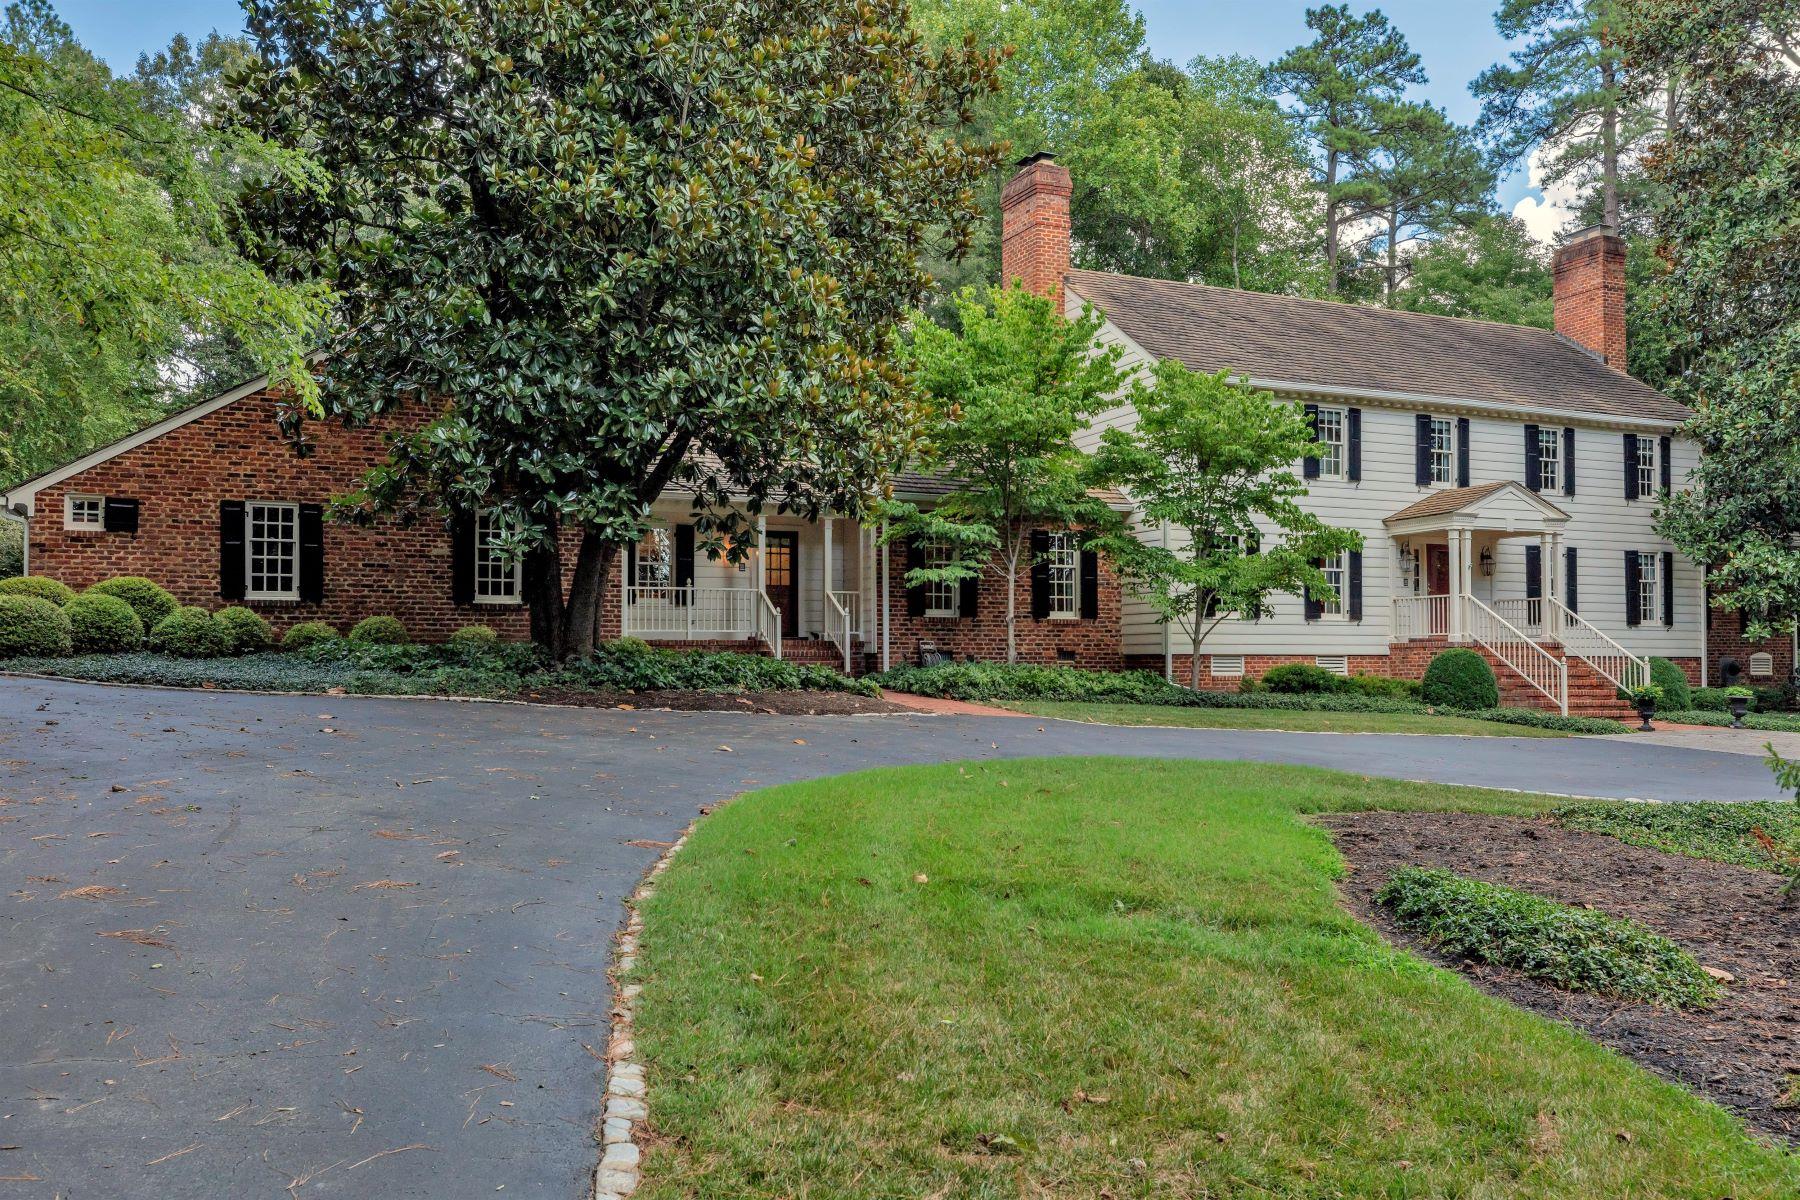 Single Family Homes for Sale at 9700 St. Julians Lane, Henrico, Va, 23238 Henrico, Virginia 23238 United States